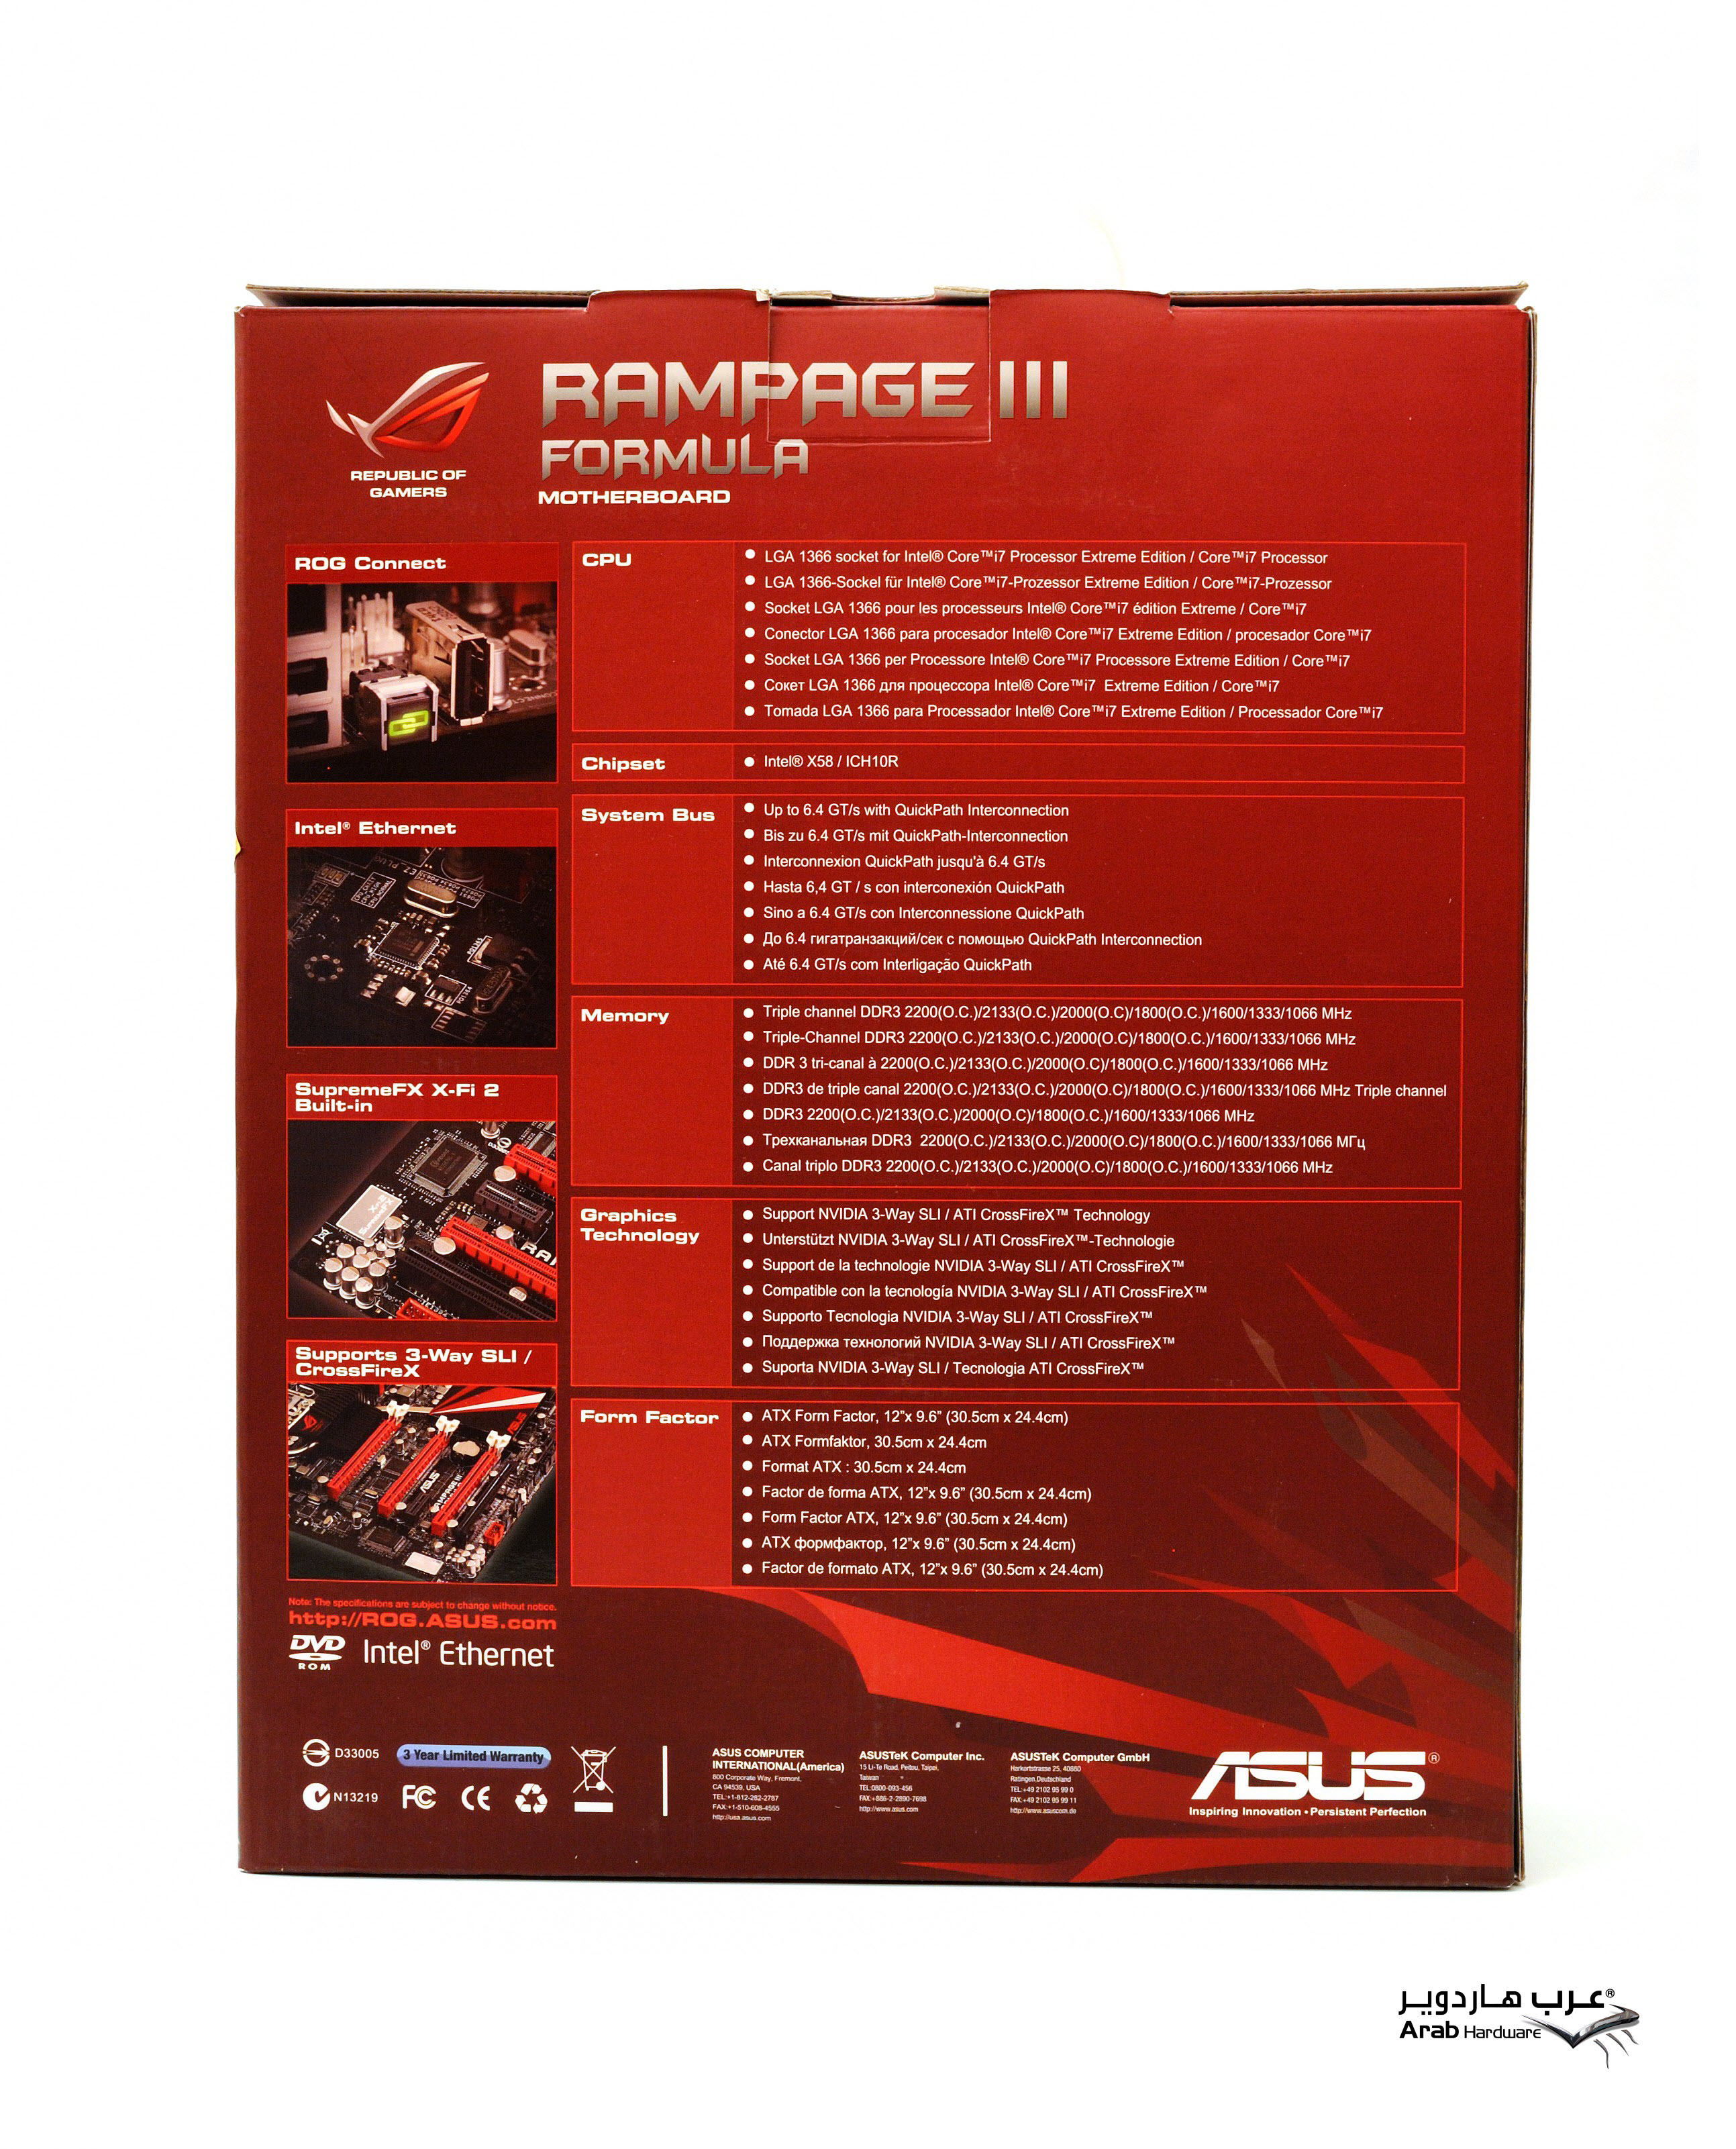 Rampage III